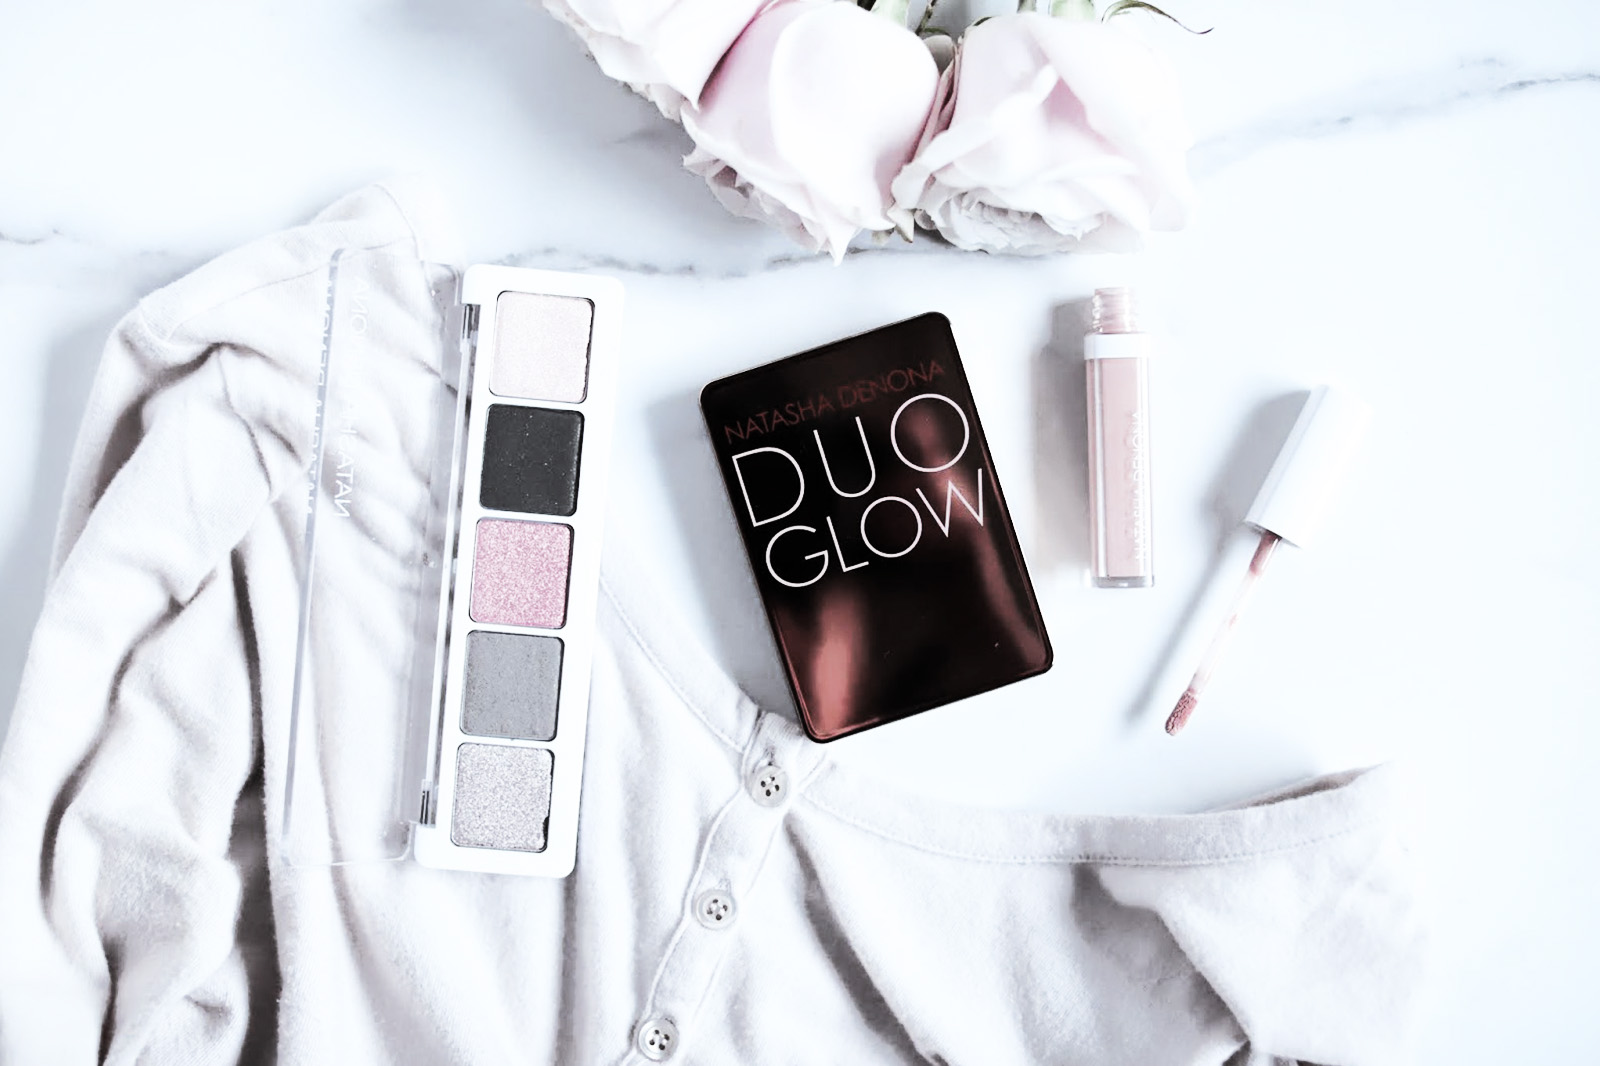 natasha denona lip glaze 18 flesh eyeshedow palette 5 duo glow blush 02 rayo avis test swatch swatches